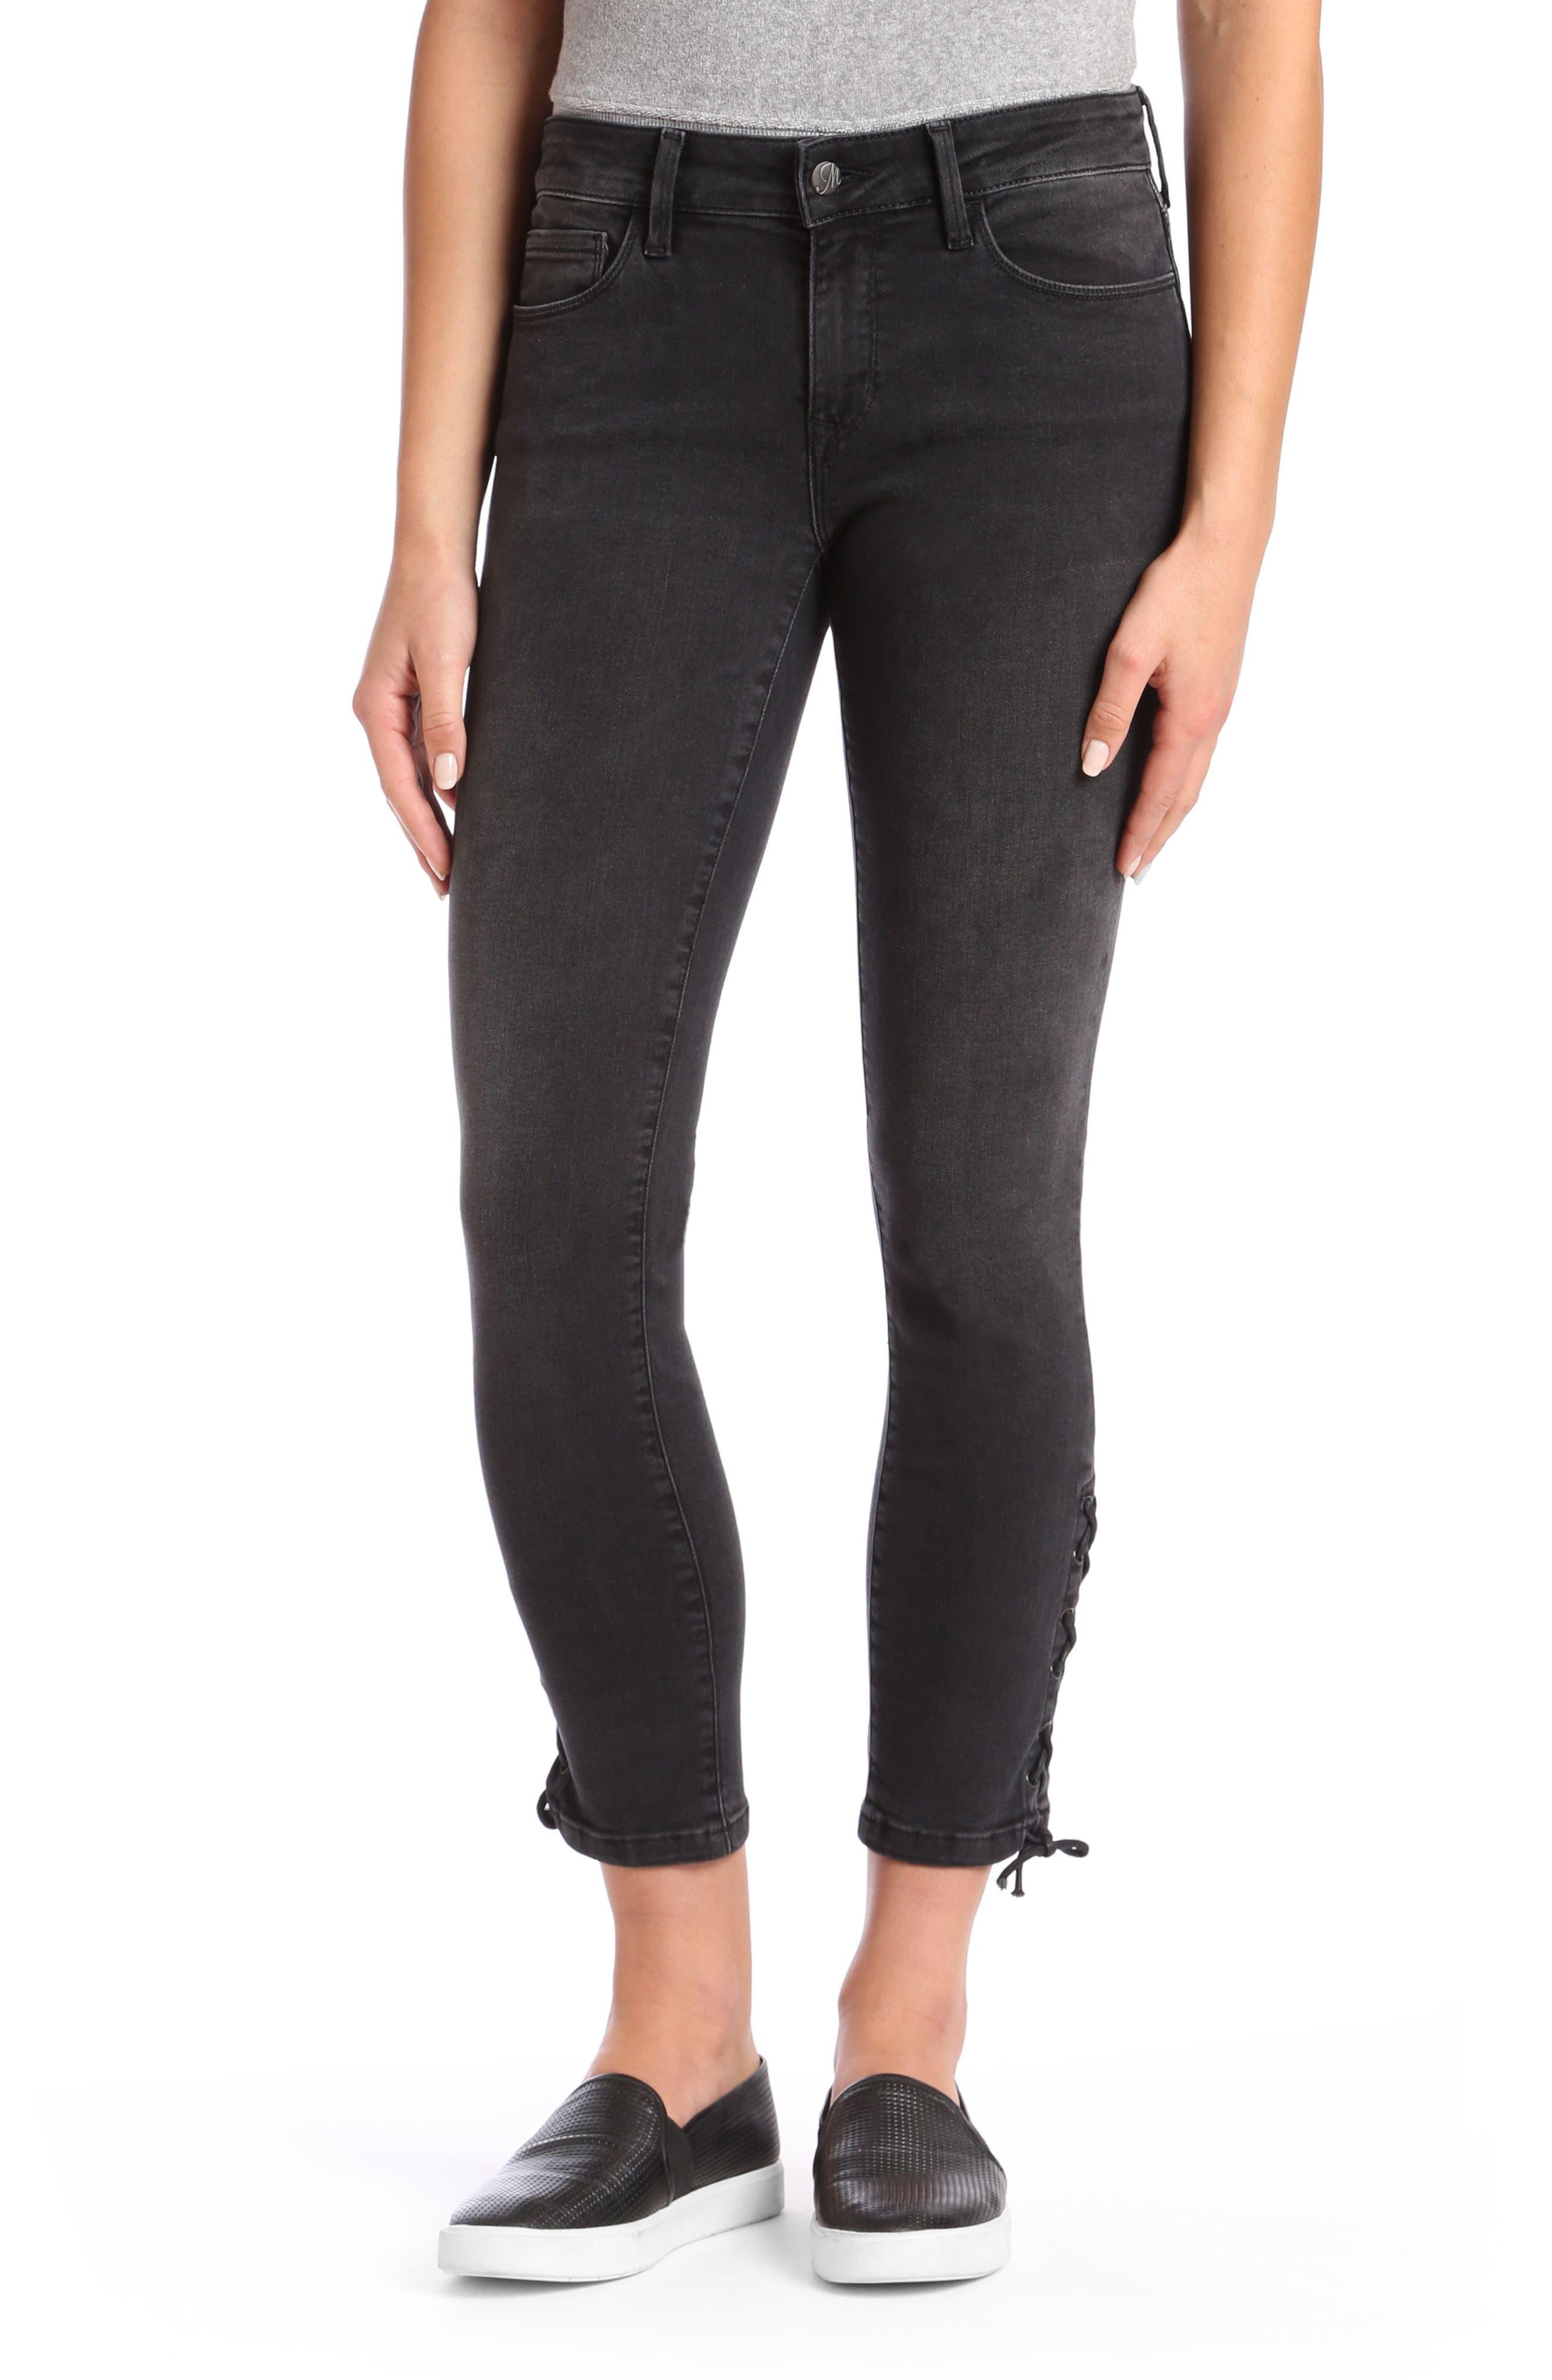 Alternate Image 1 Selected - Mavi Adriana Lace Up Ankle Super Skinny Jeans (Smoke Lace)